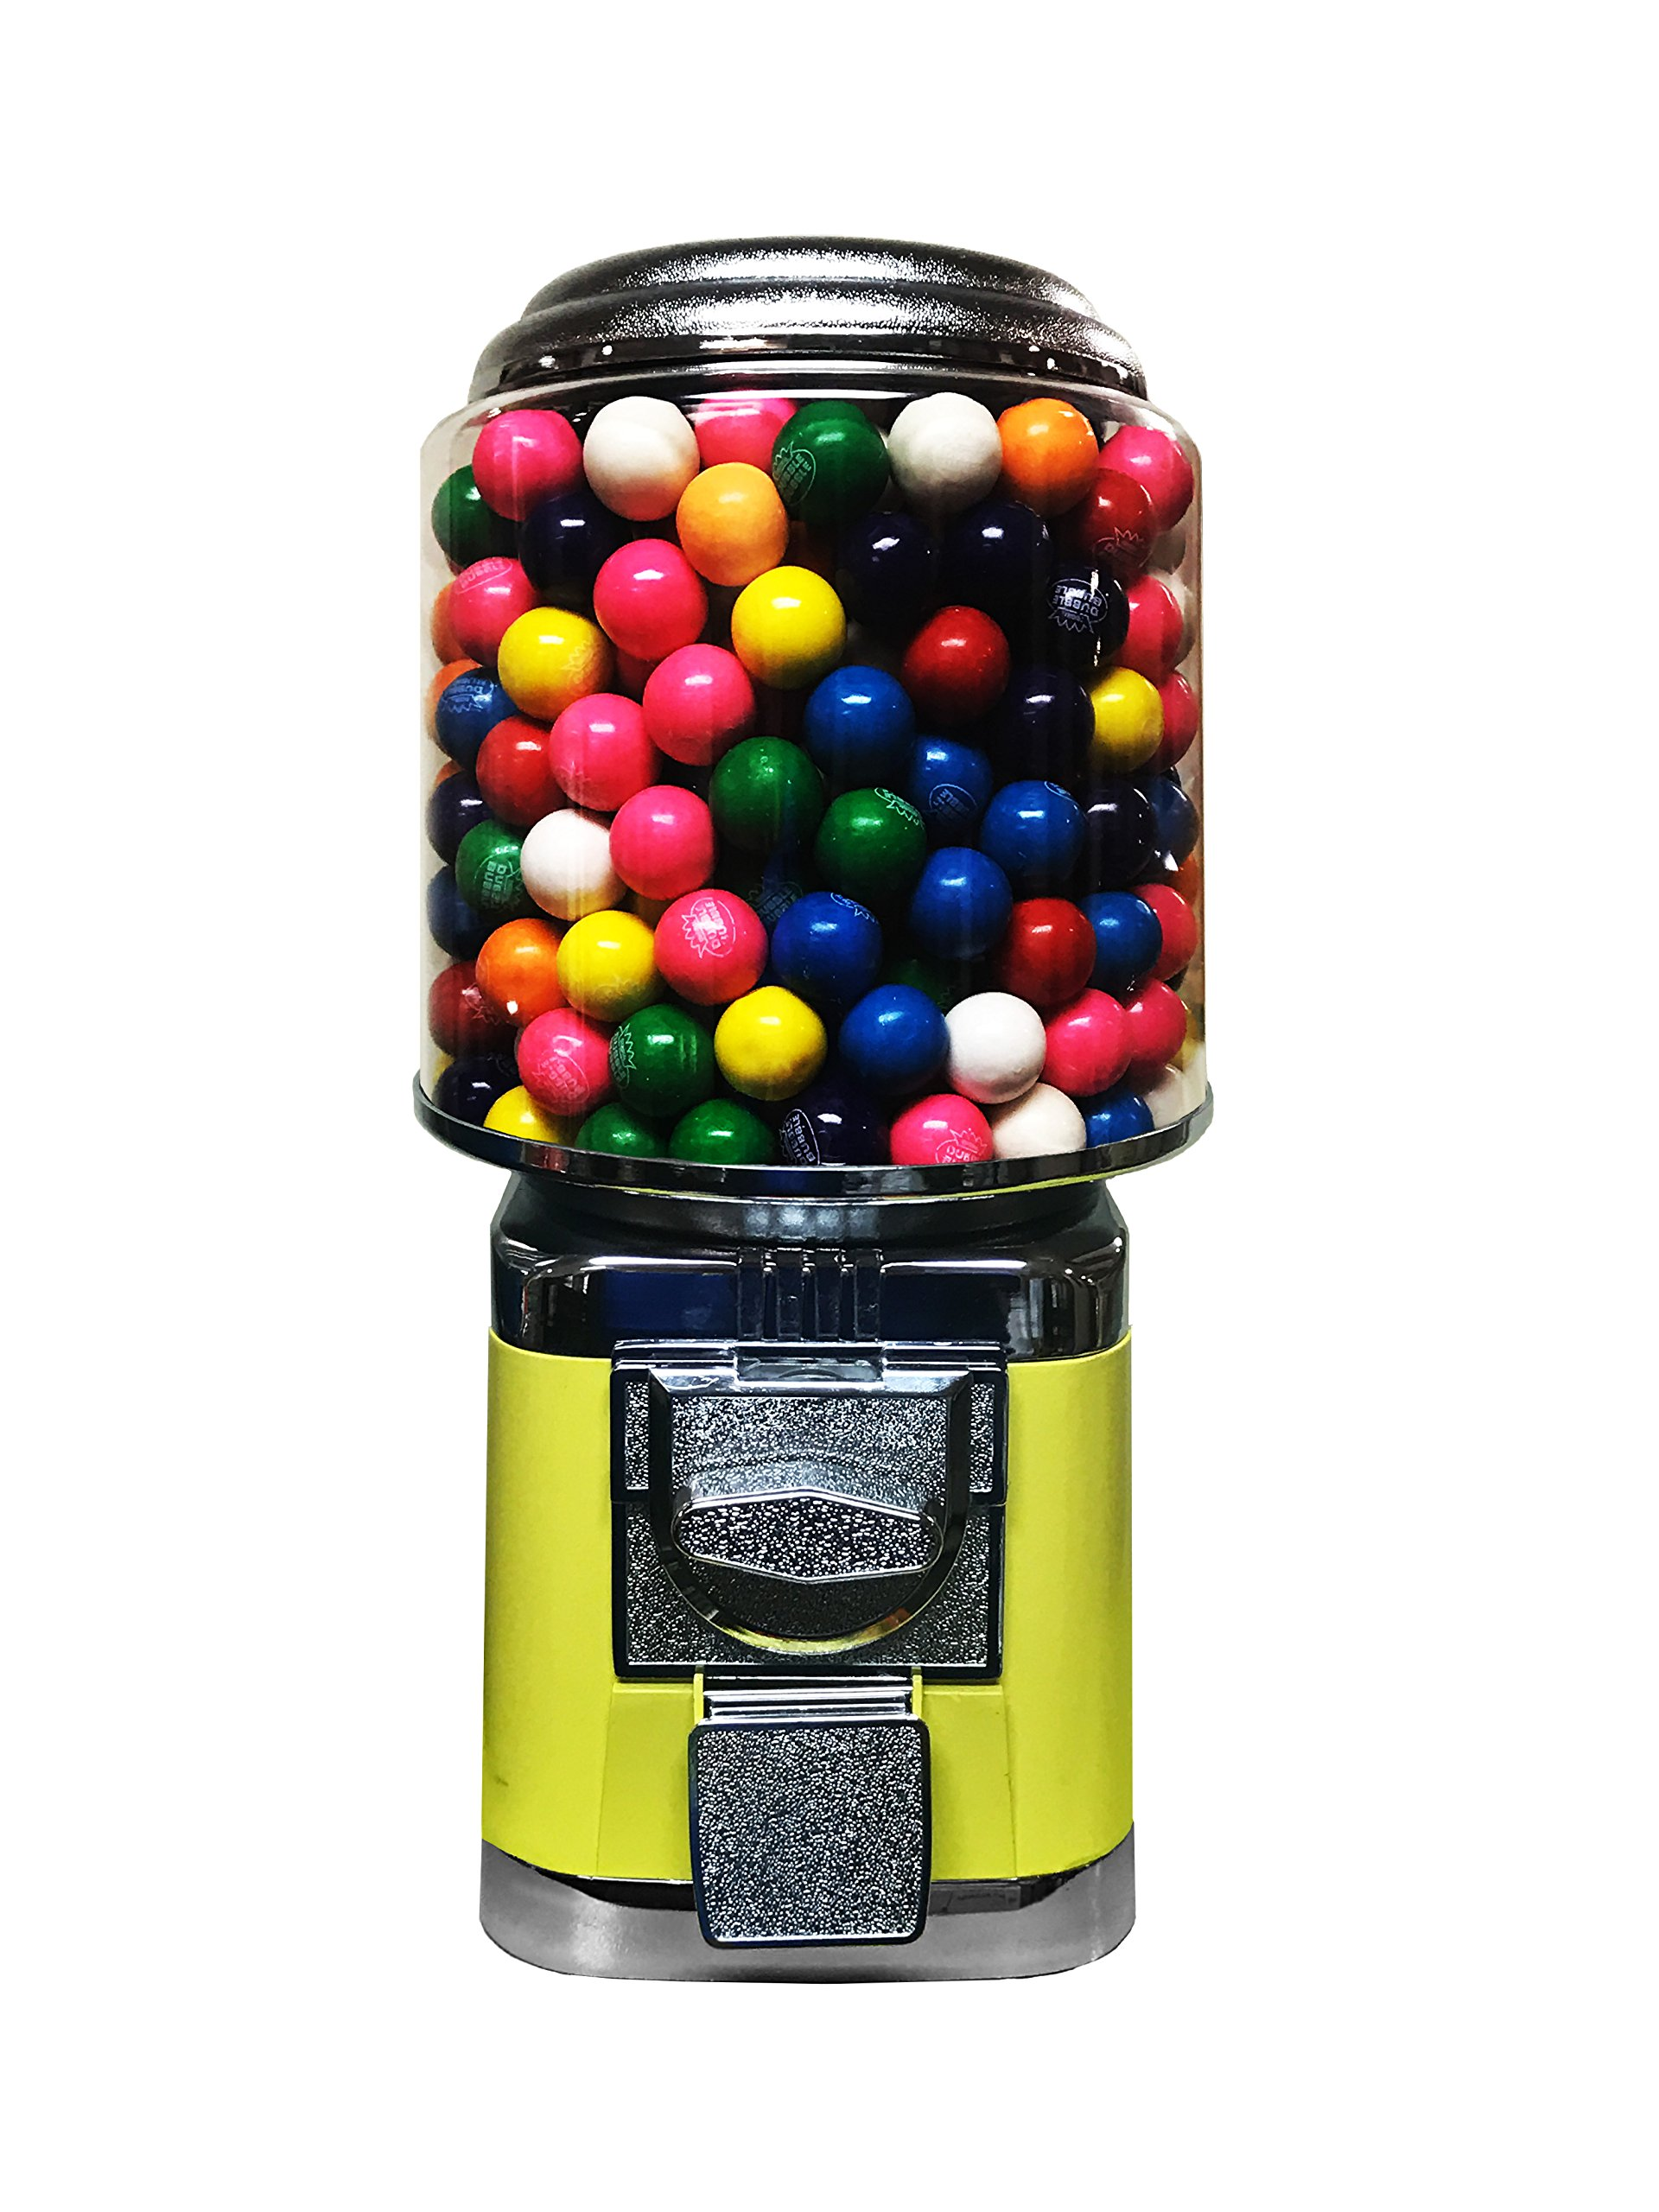 Wholesale Vending Products All Metal Bulk Vending Gumball Machine (Yellow)